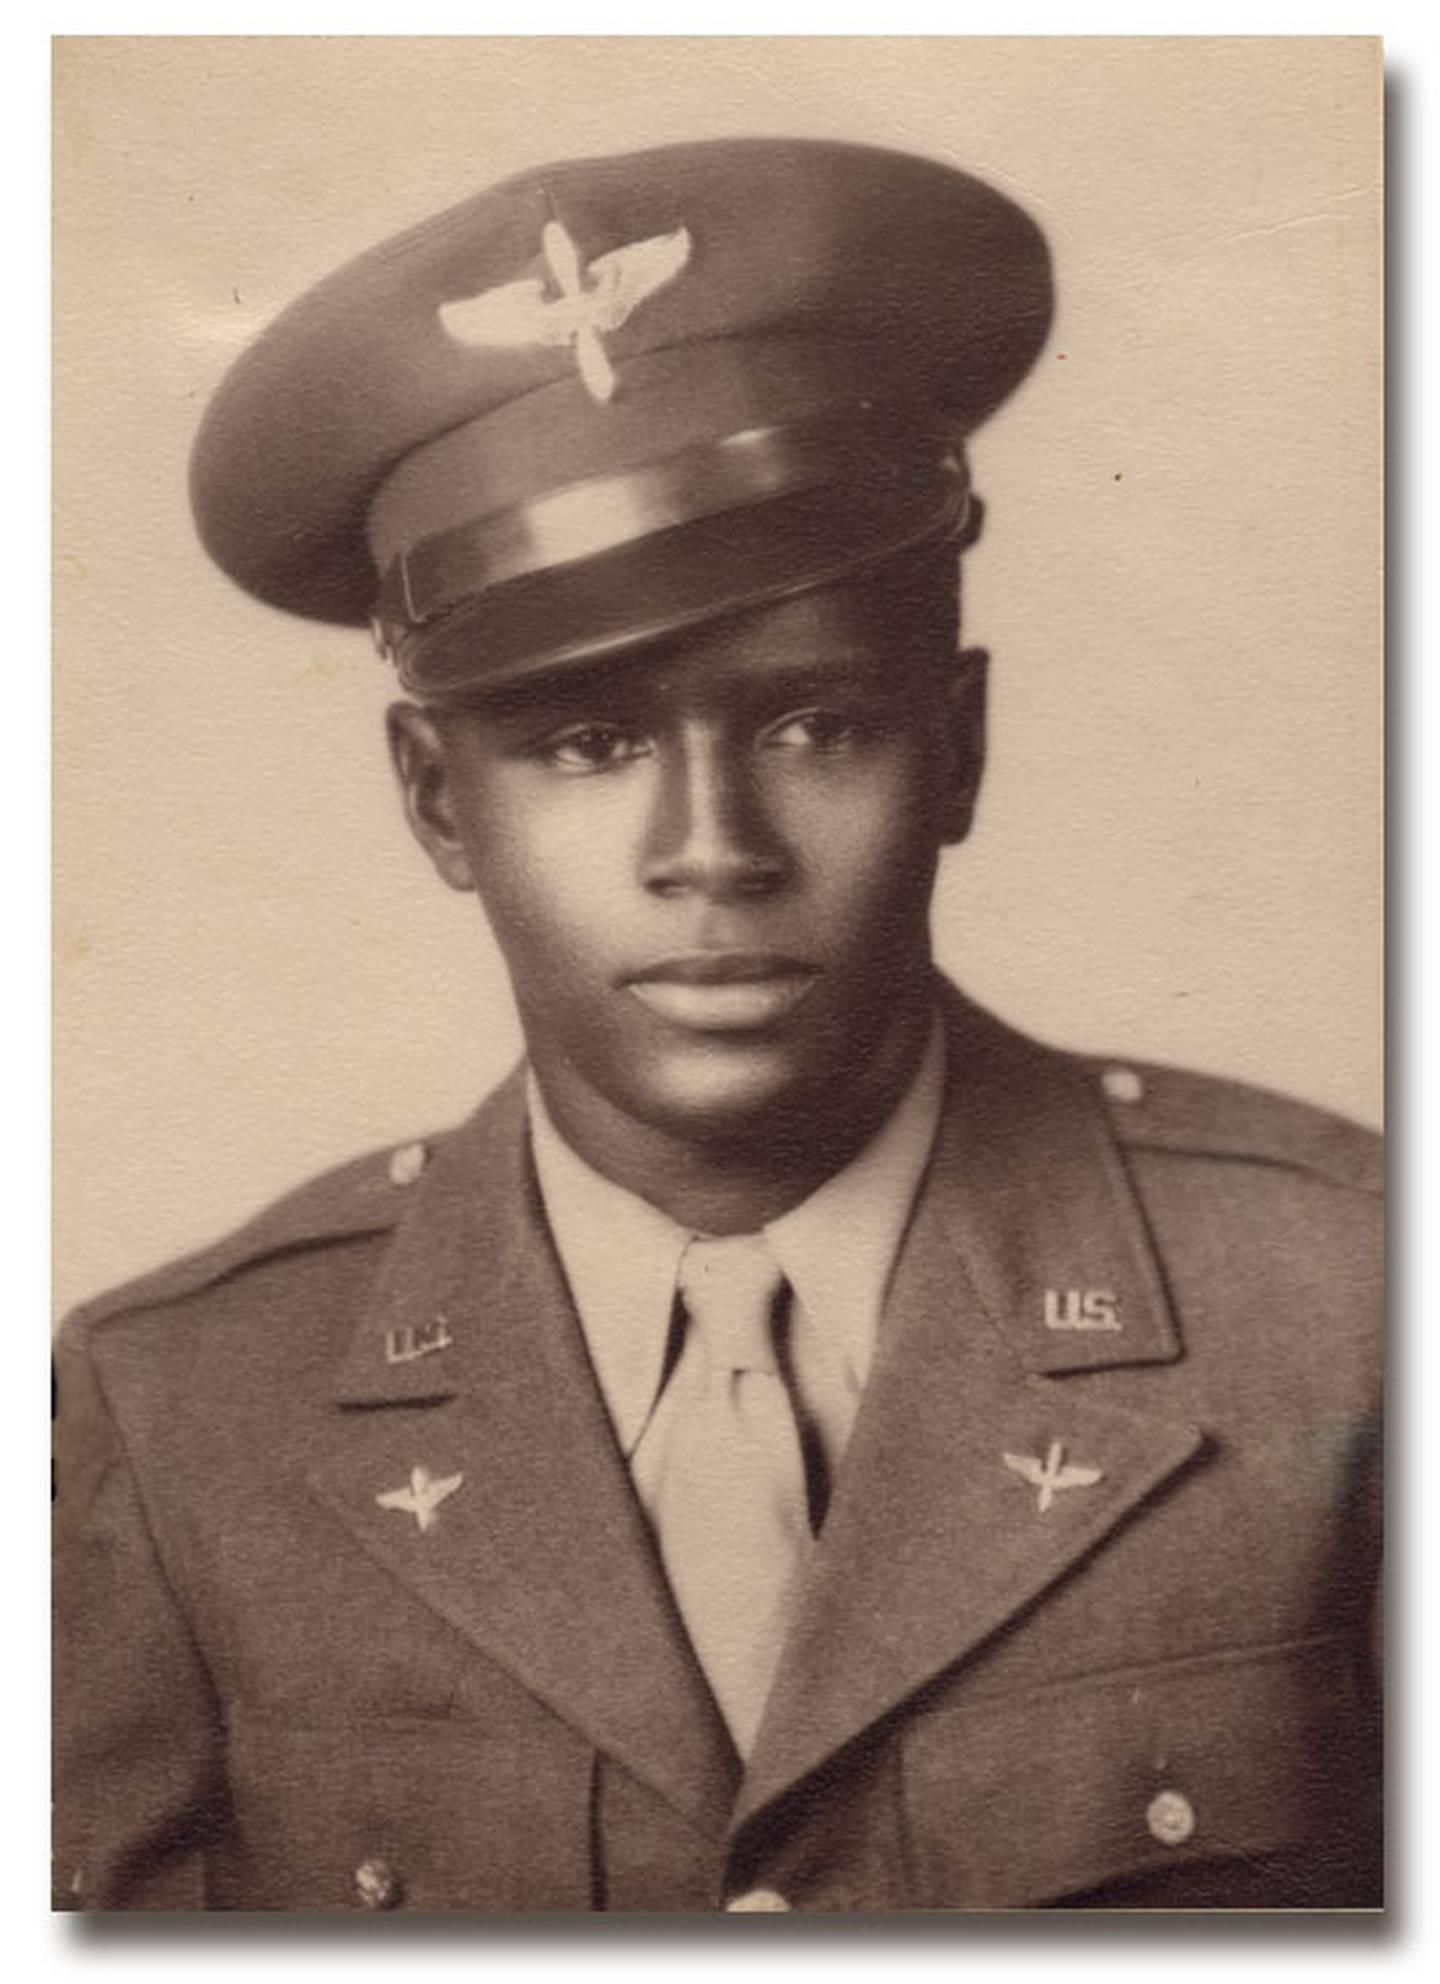 James Harvey (Air Force photo)